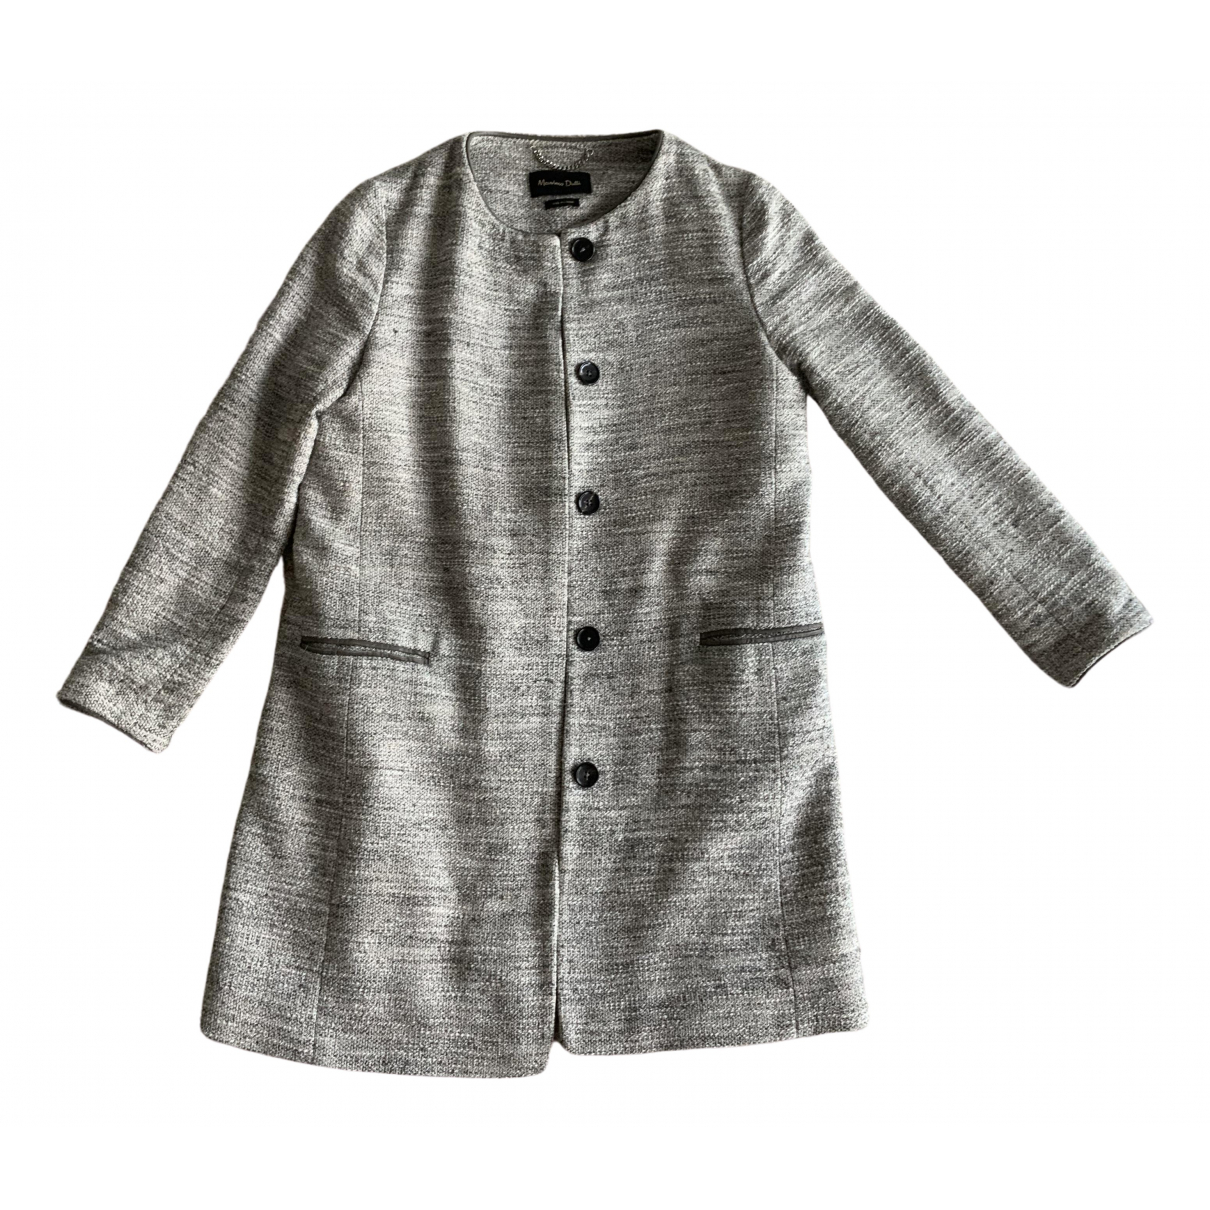 Massimo Dutti \N Cotton coat for Women 38 FR